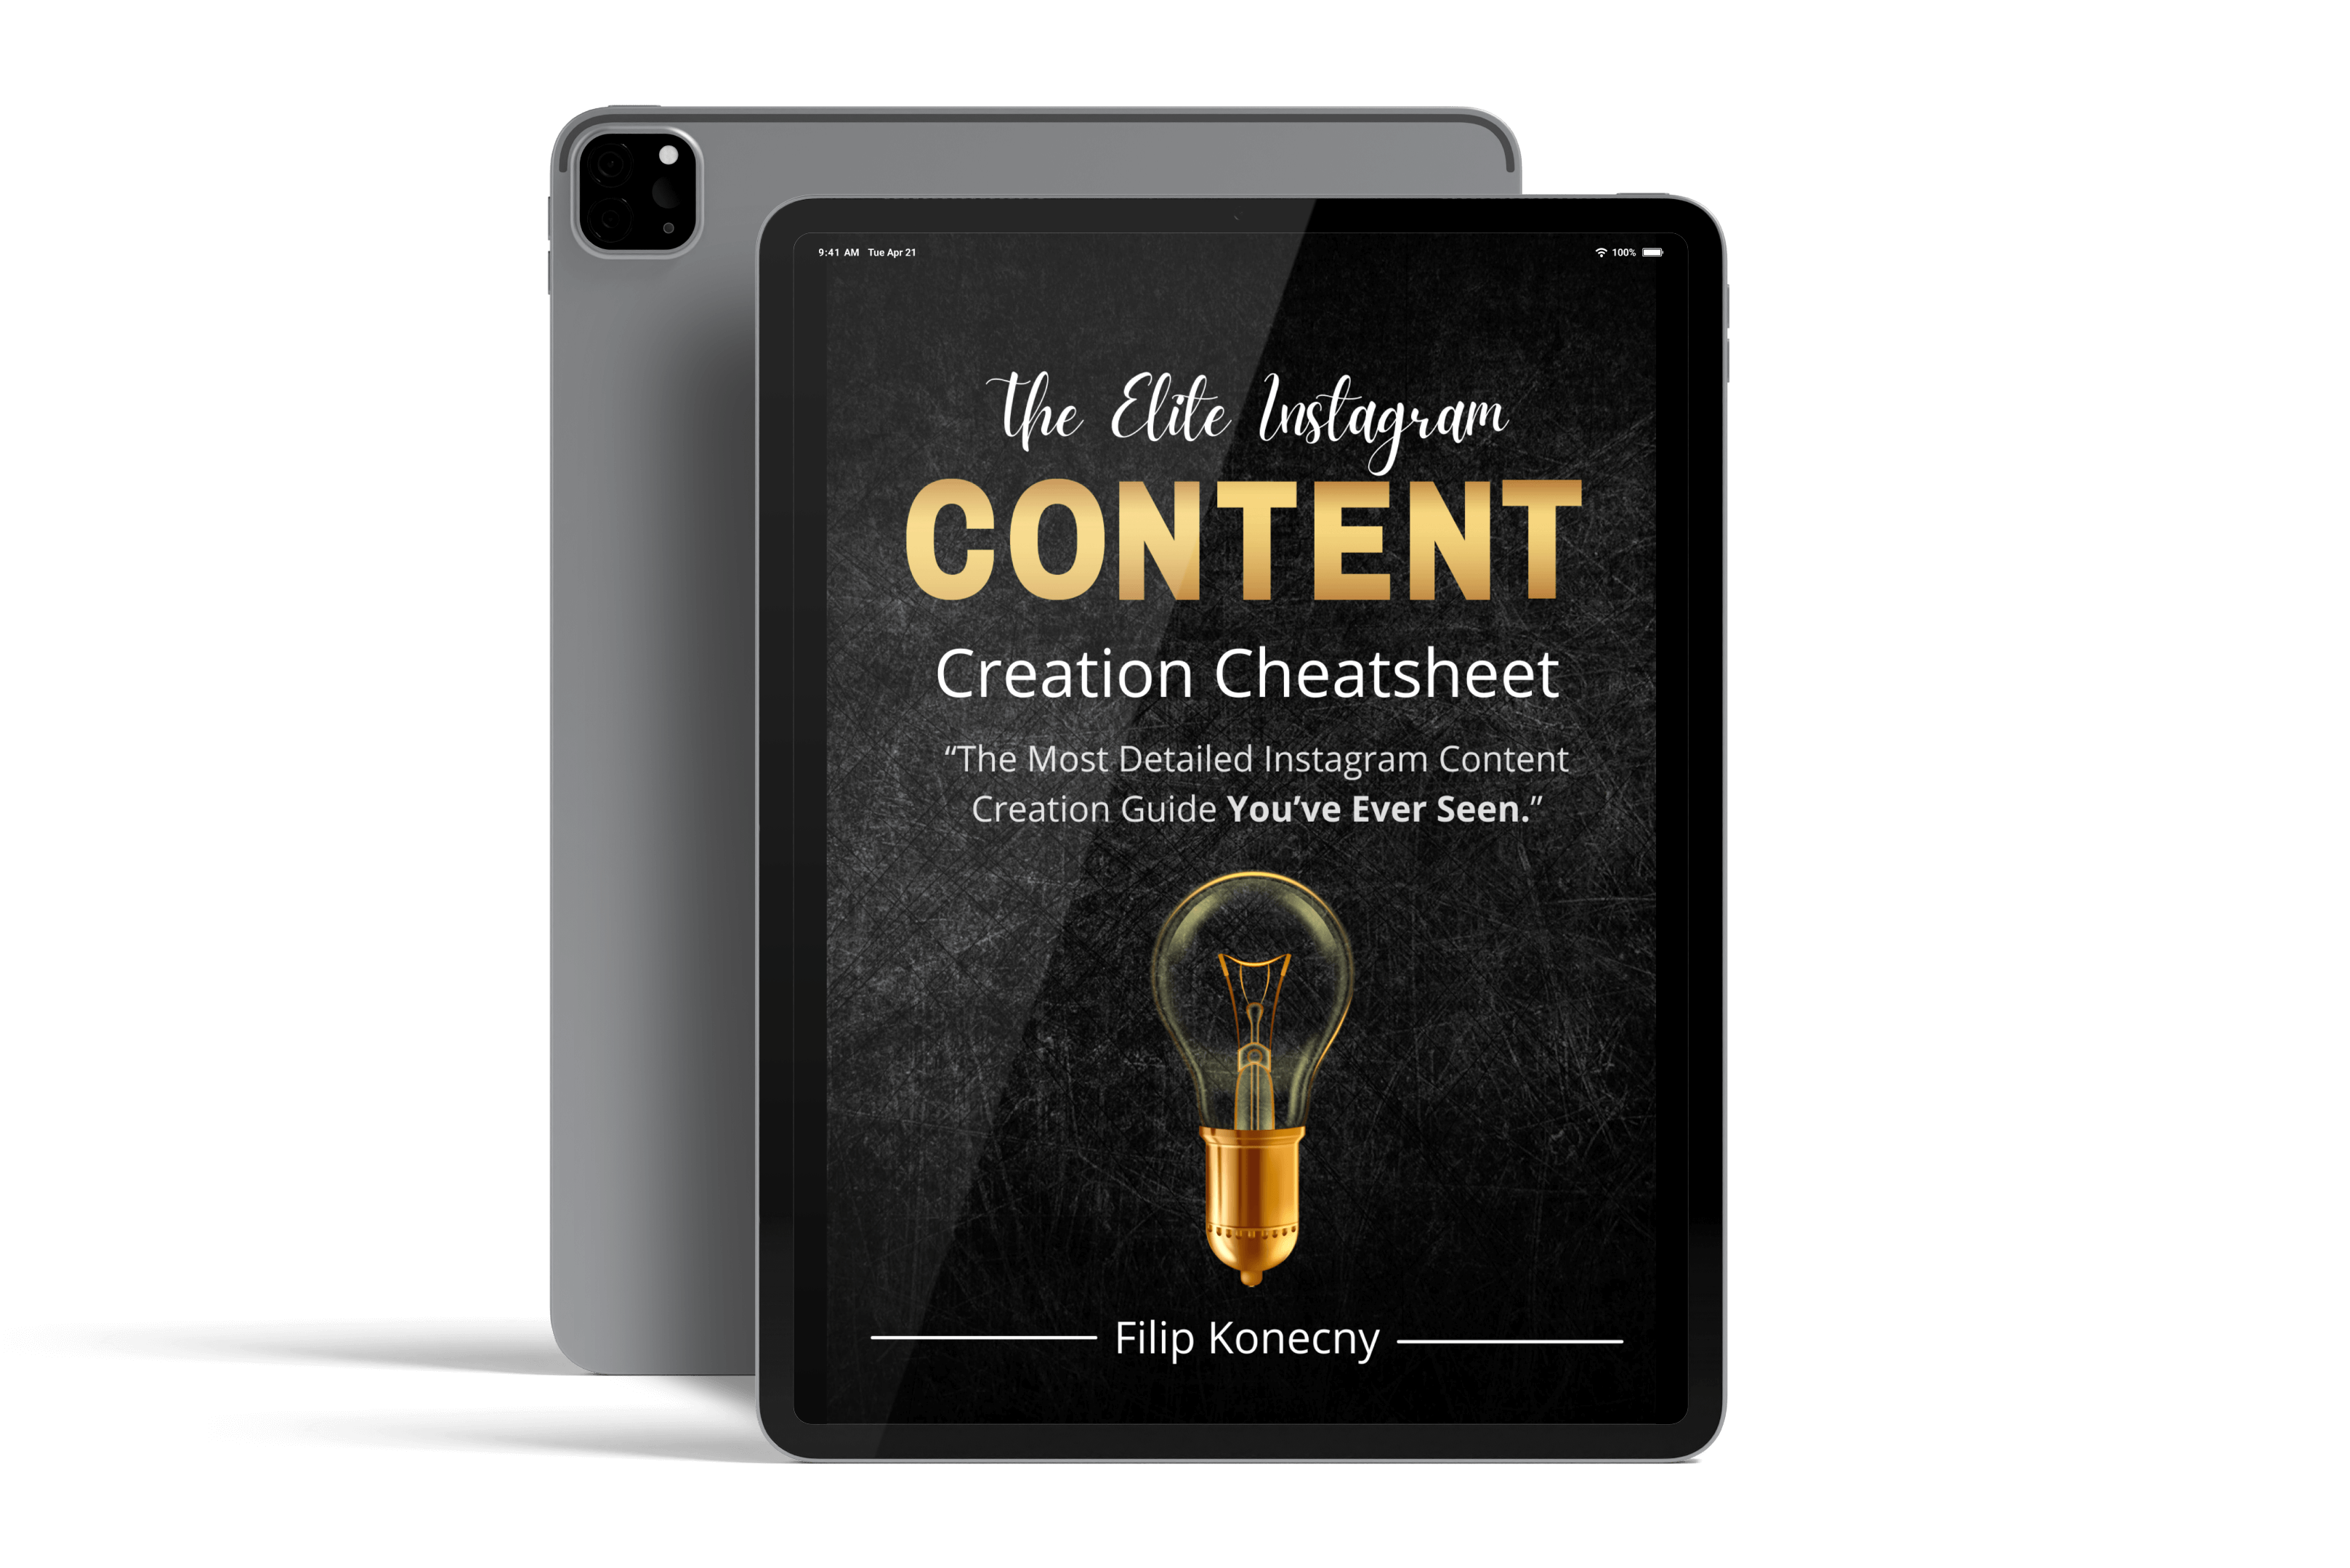 Elite Instagram Content Creation Cheatsheet E-book Image